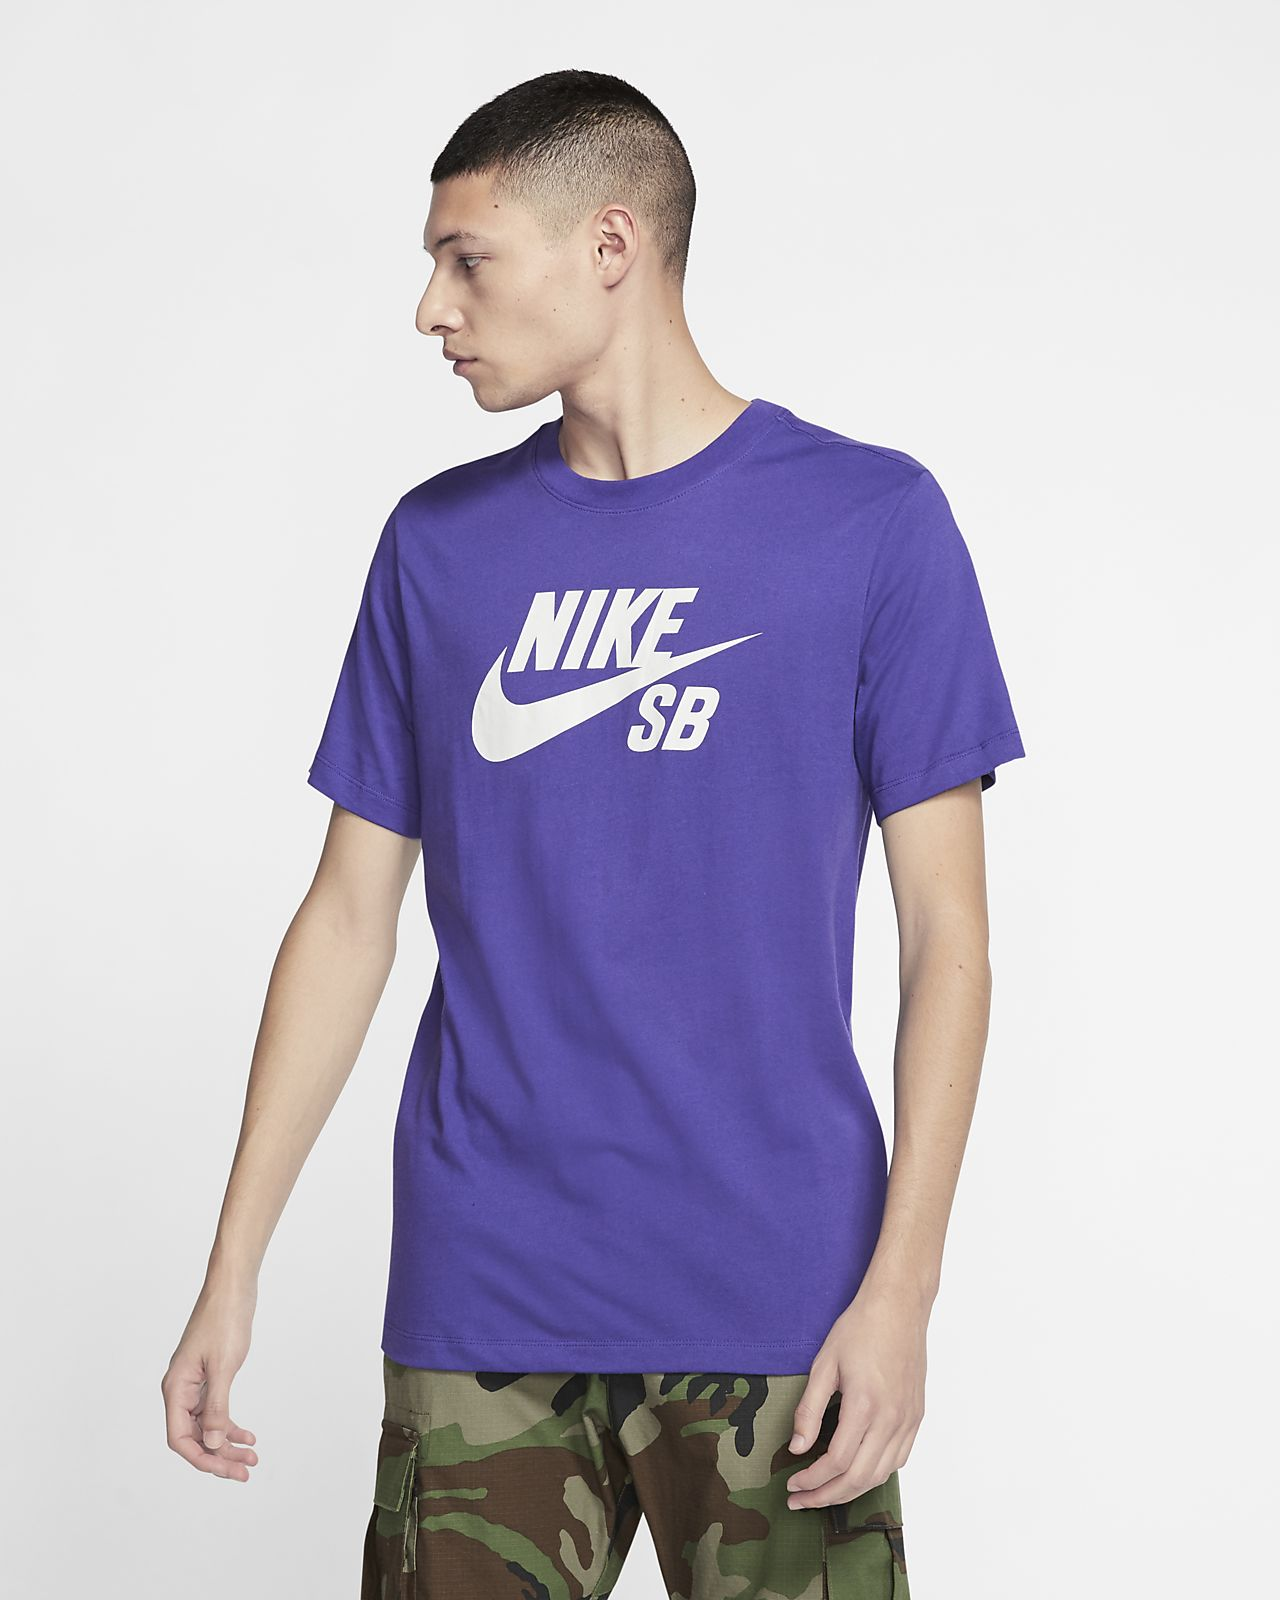 Nike SB Dri FIT Skate T Shirt